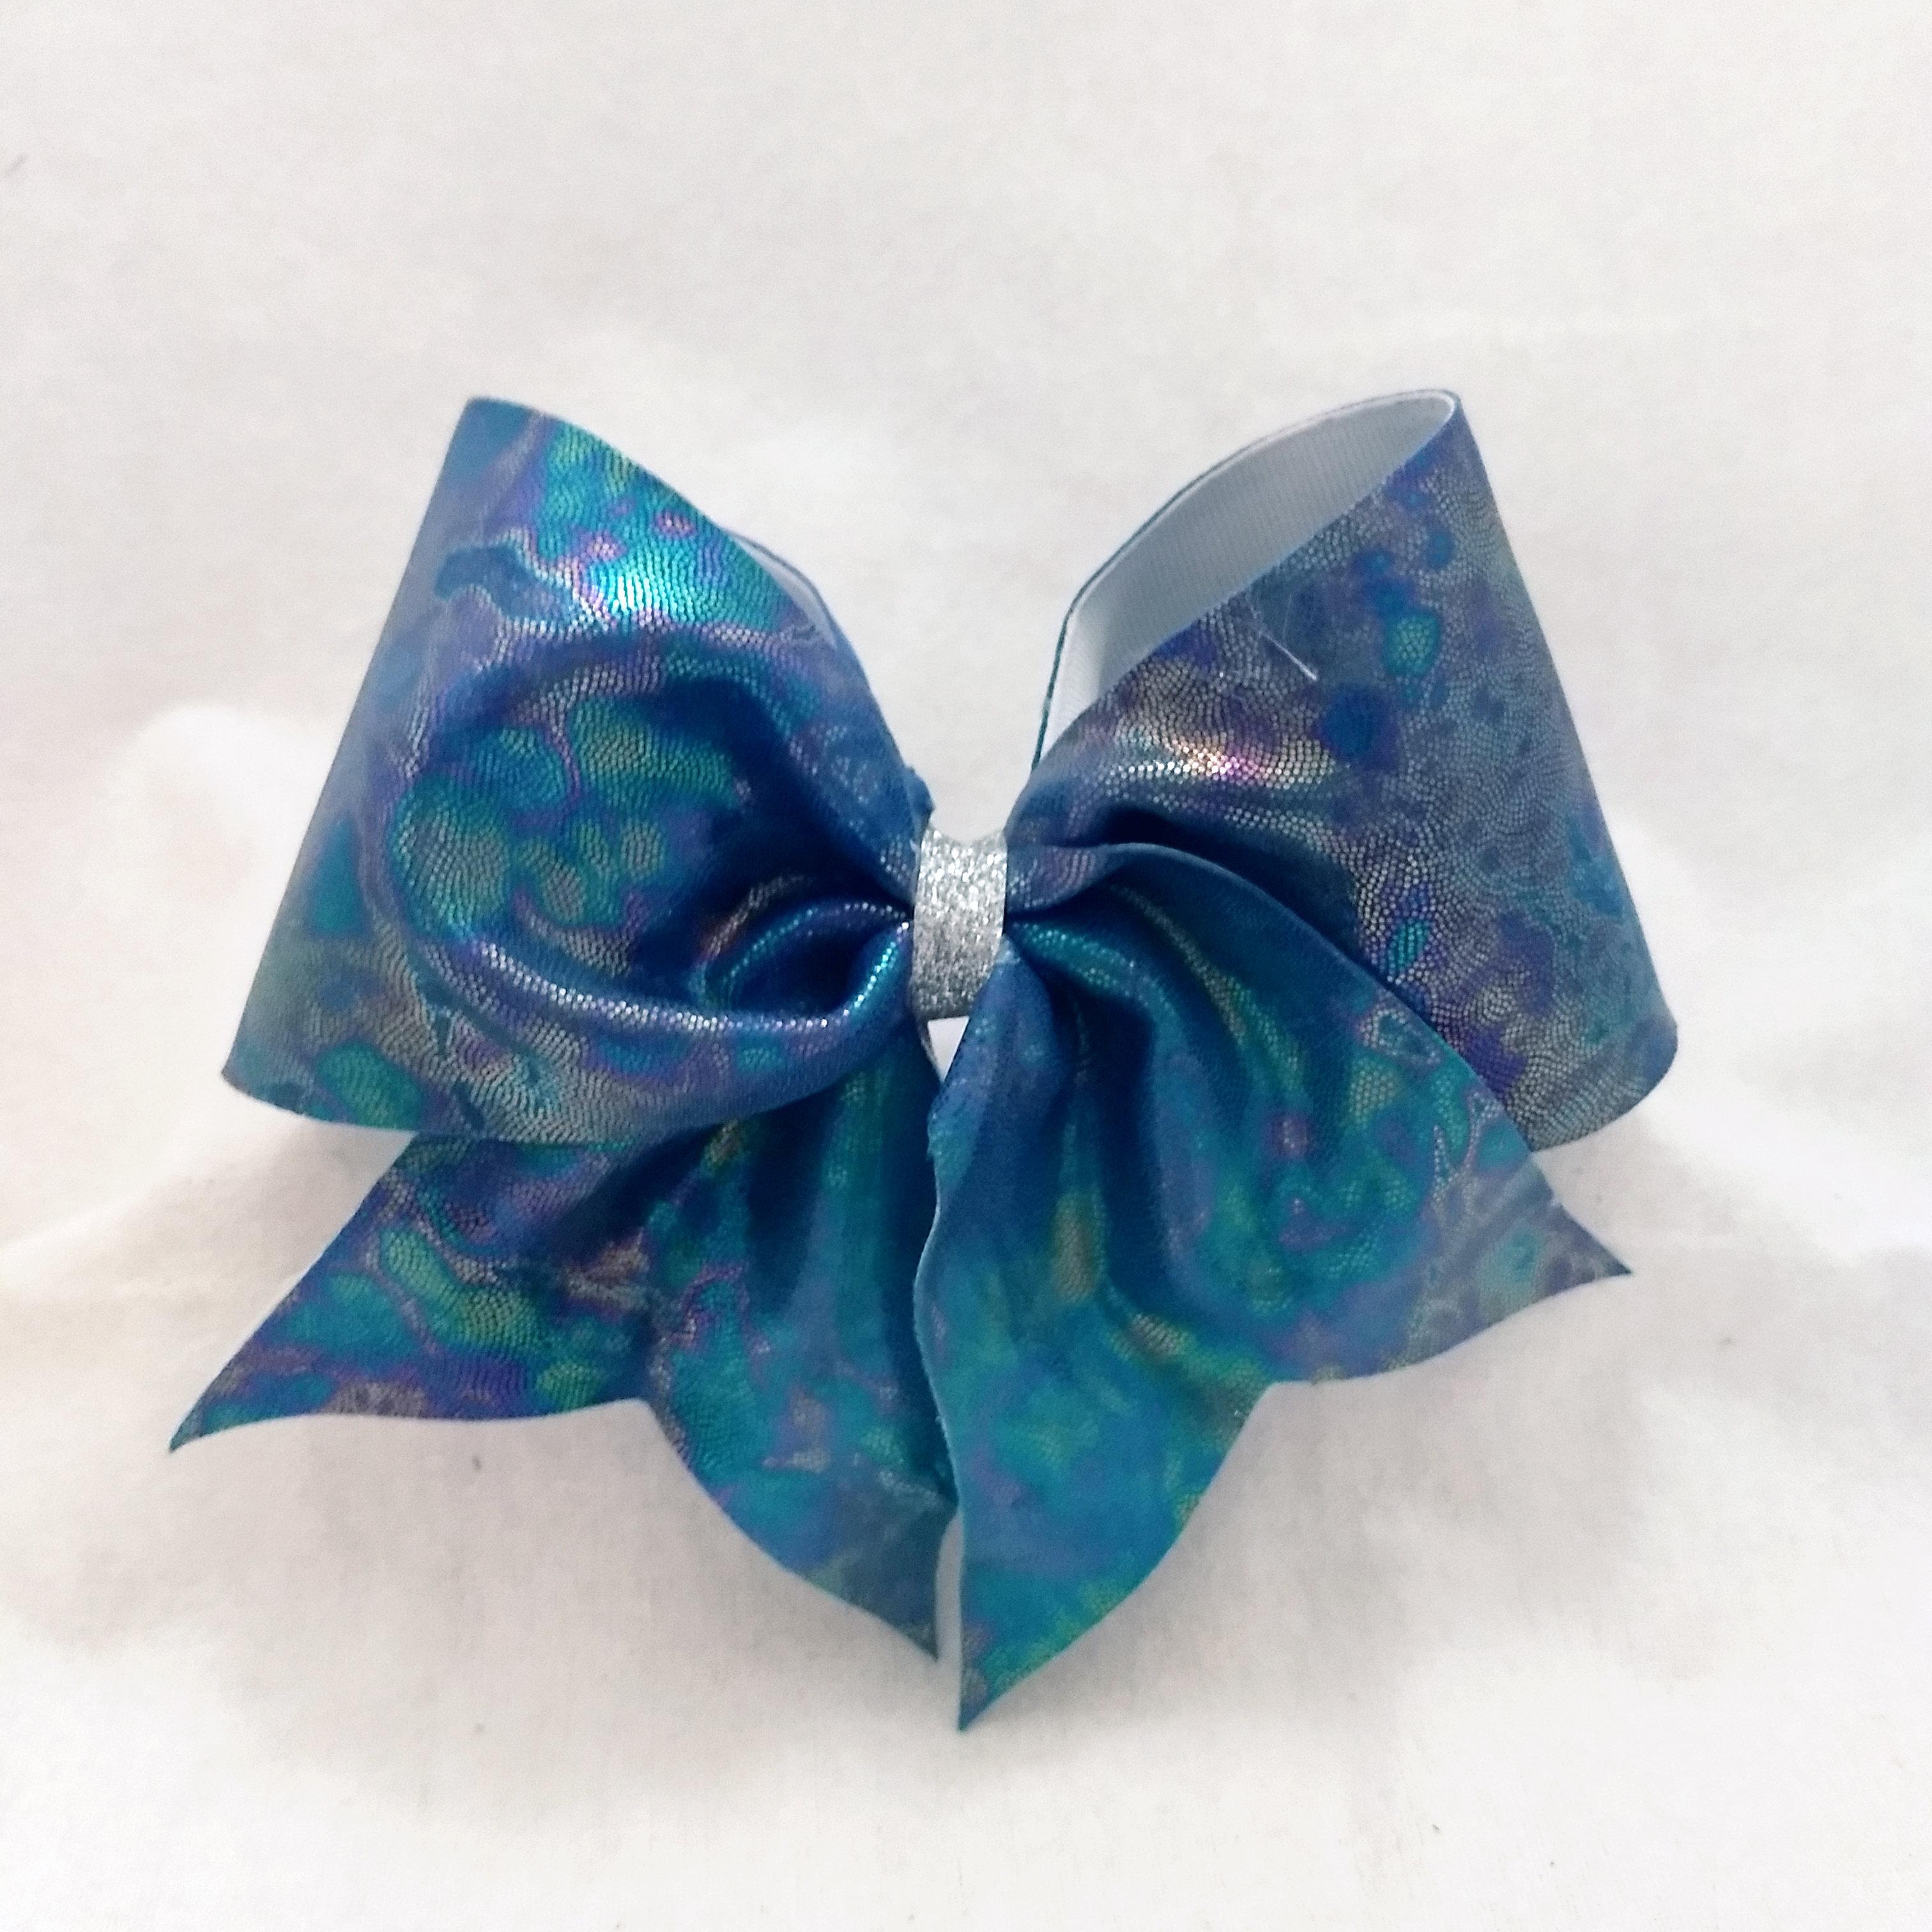 Tie-Dye Mystique Cheer Bow BW-TDM